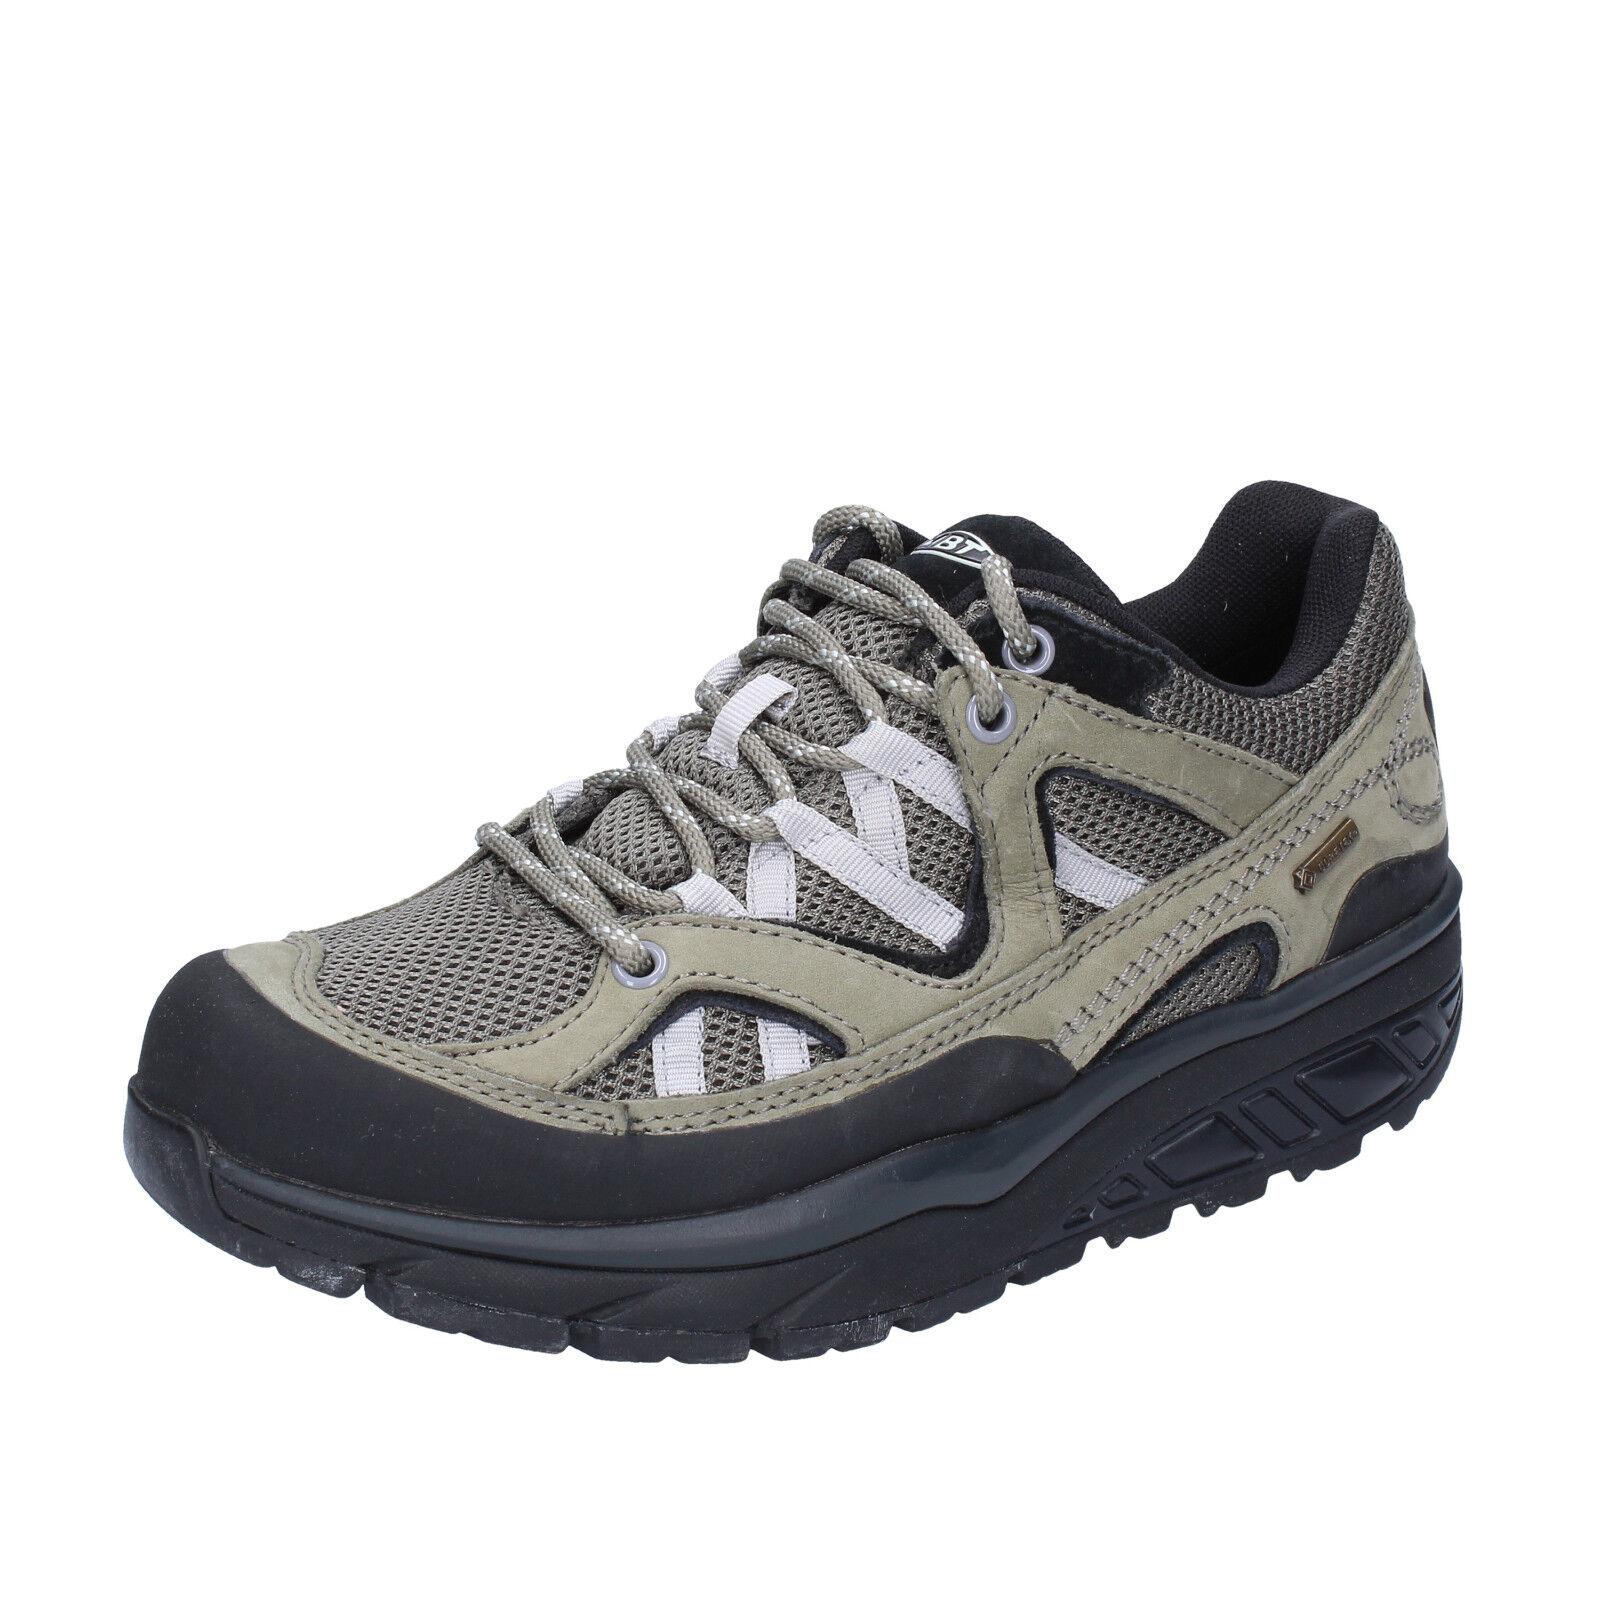 women's shoes MBT 12 / 12,5 () sneakers green gray textile nabuk BT23-43